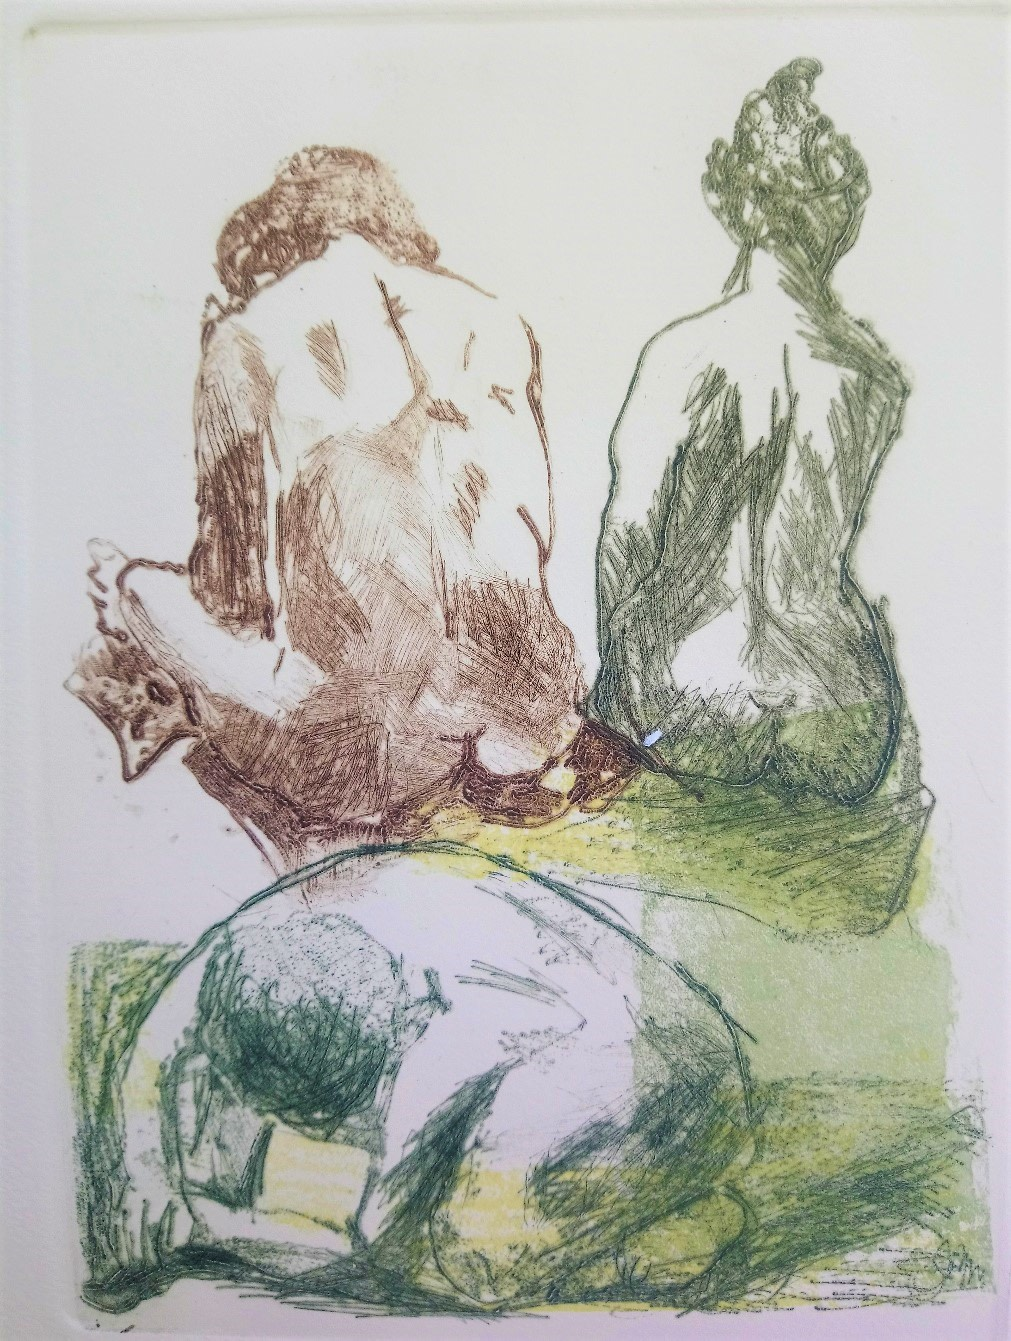 "<span class=""link fancybox-details-link""><a href=""/exhibitions/21/works/artworks_standalone10987/"">View Detail Page</a></span><div class=""artist""><span class=""artist""><strong>Daphne Casdagli RE</strong></span></div><div class=""title""><em>Meditation</em></div><div class=""medium"">drypoint and collagraph</div><div class=""dimensions"">48 x 35 cm framed<br>22 x 17 cm image size</div><div class=""edition_details"">edition of 11</div>"